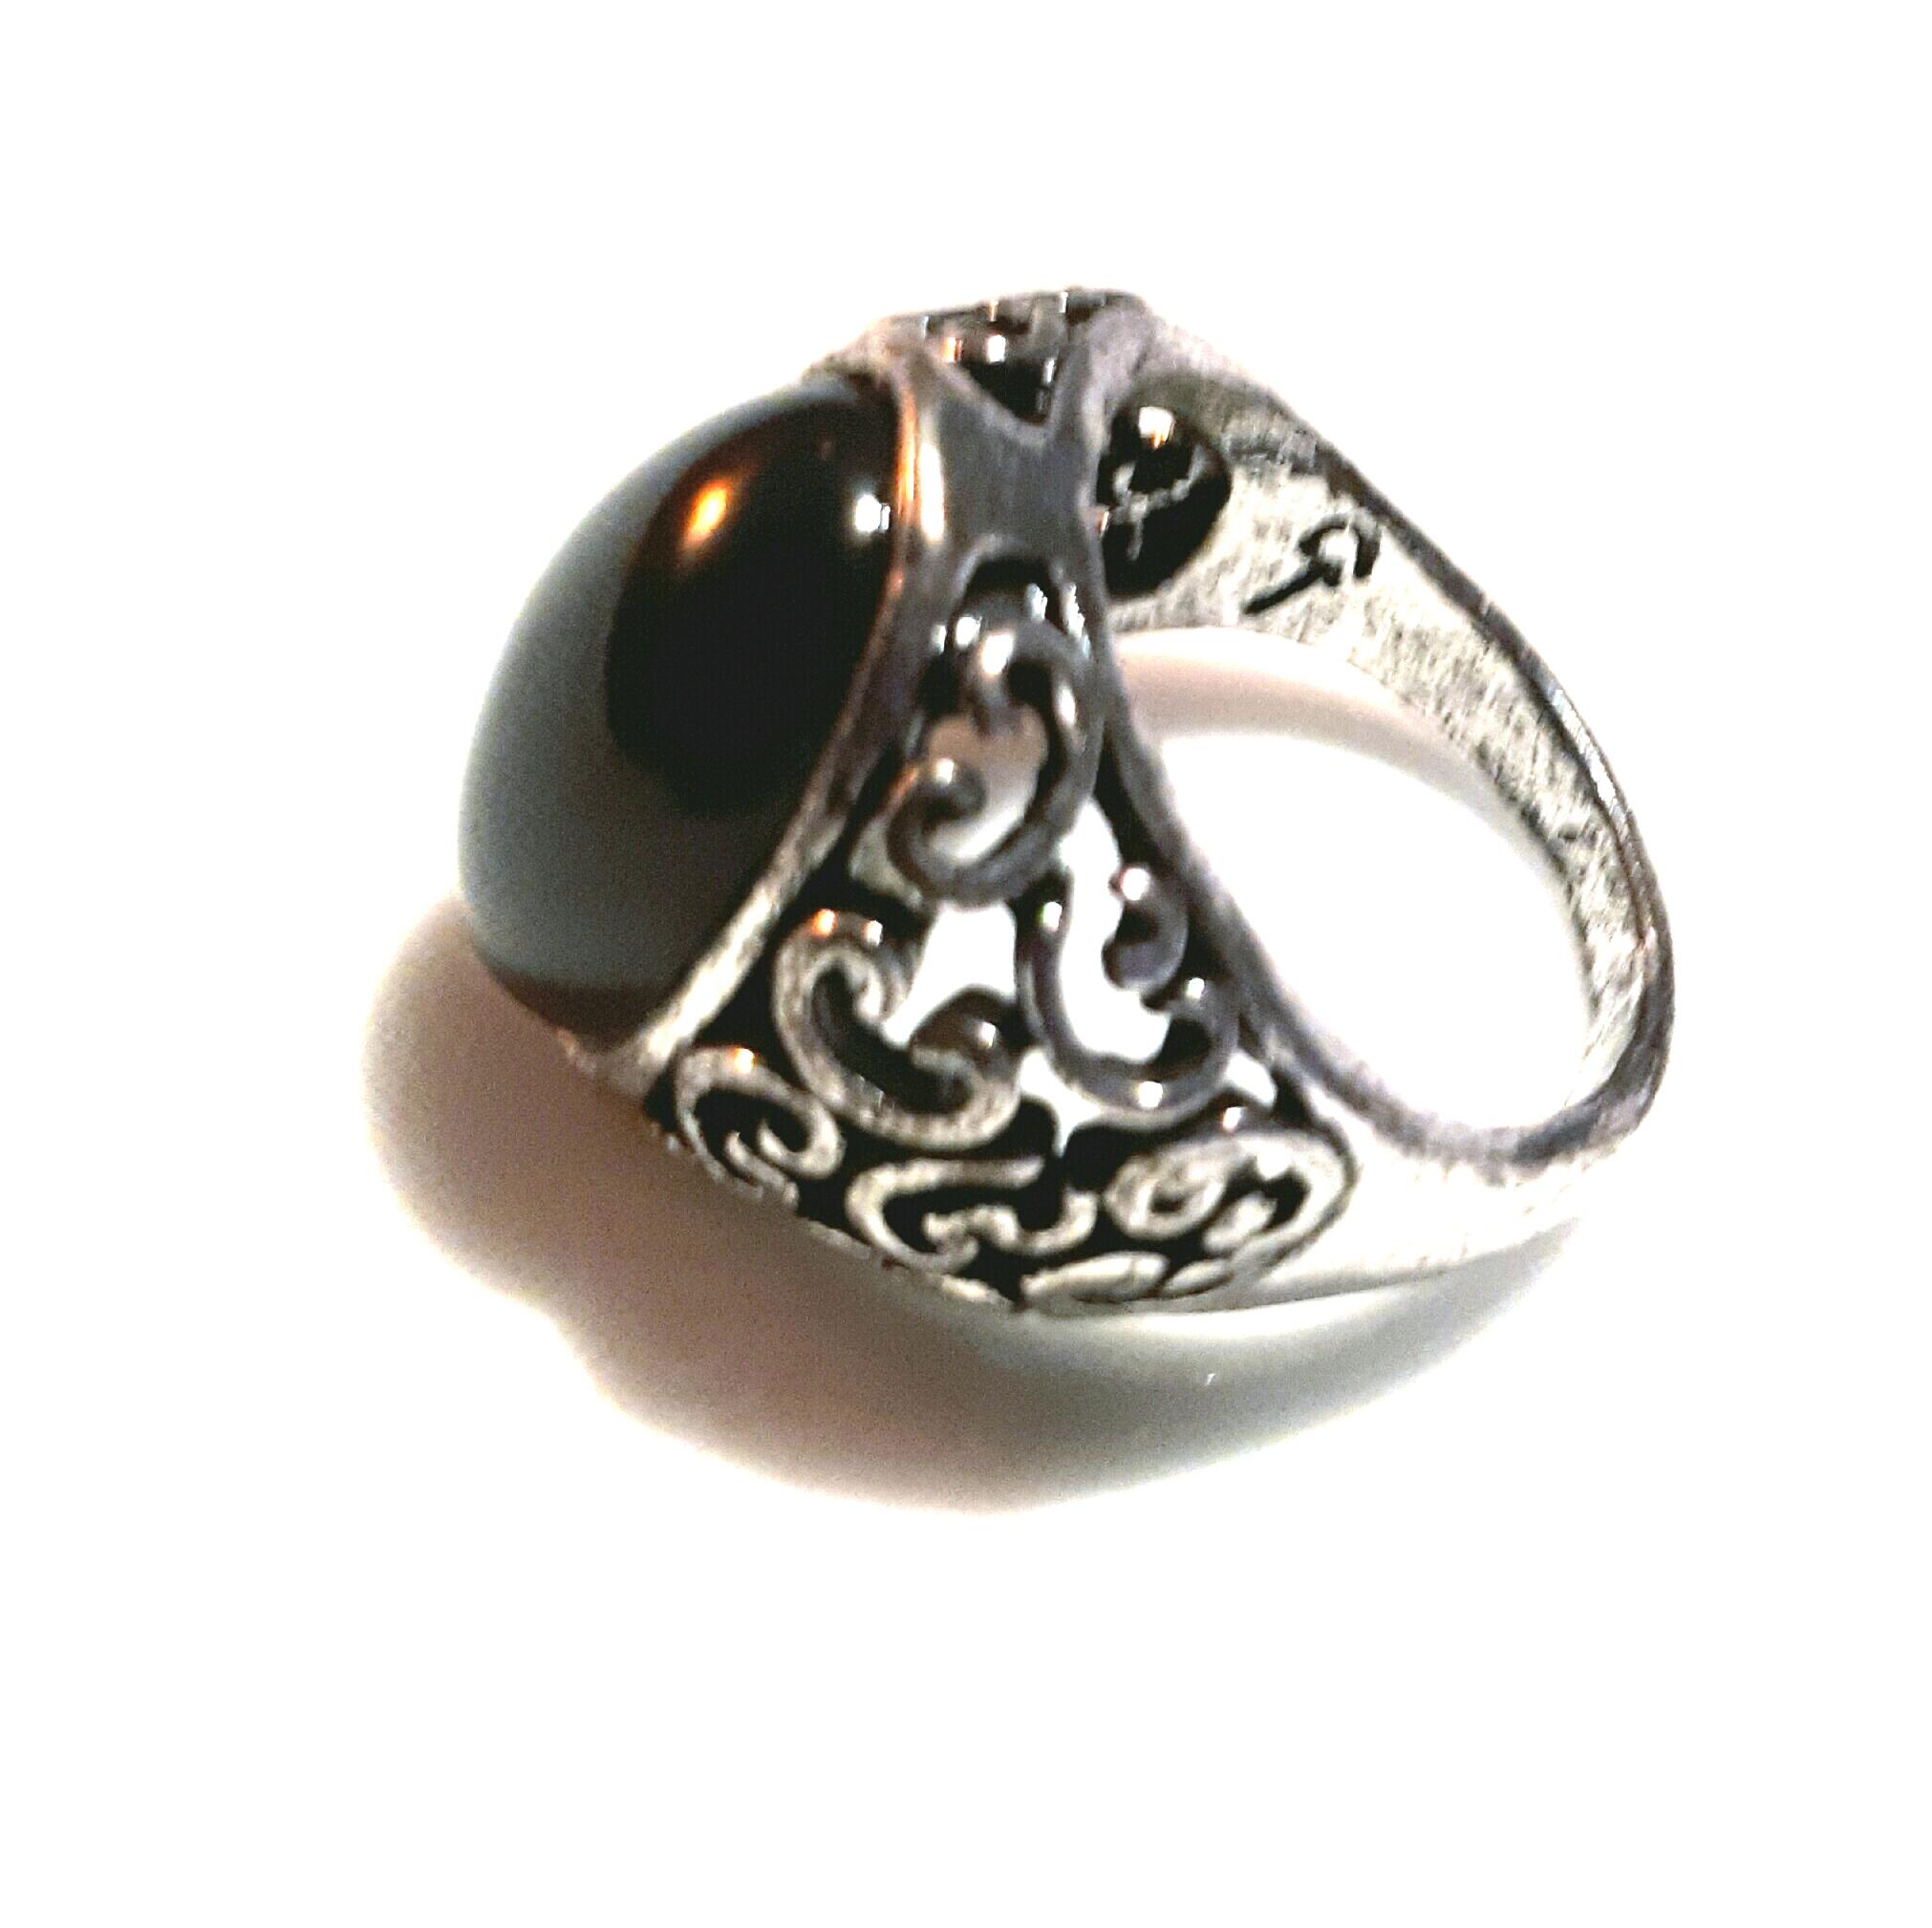 rebelsmarket_goth_old_silver_metal_antique_look_black_oval_engraved_design_ring_size_sml_rings_4.jpg